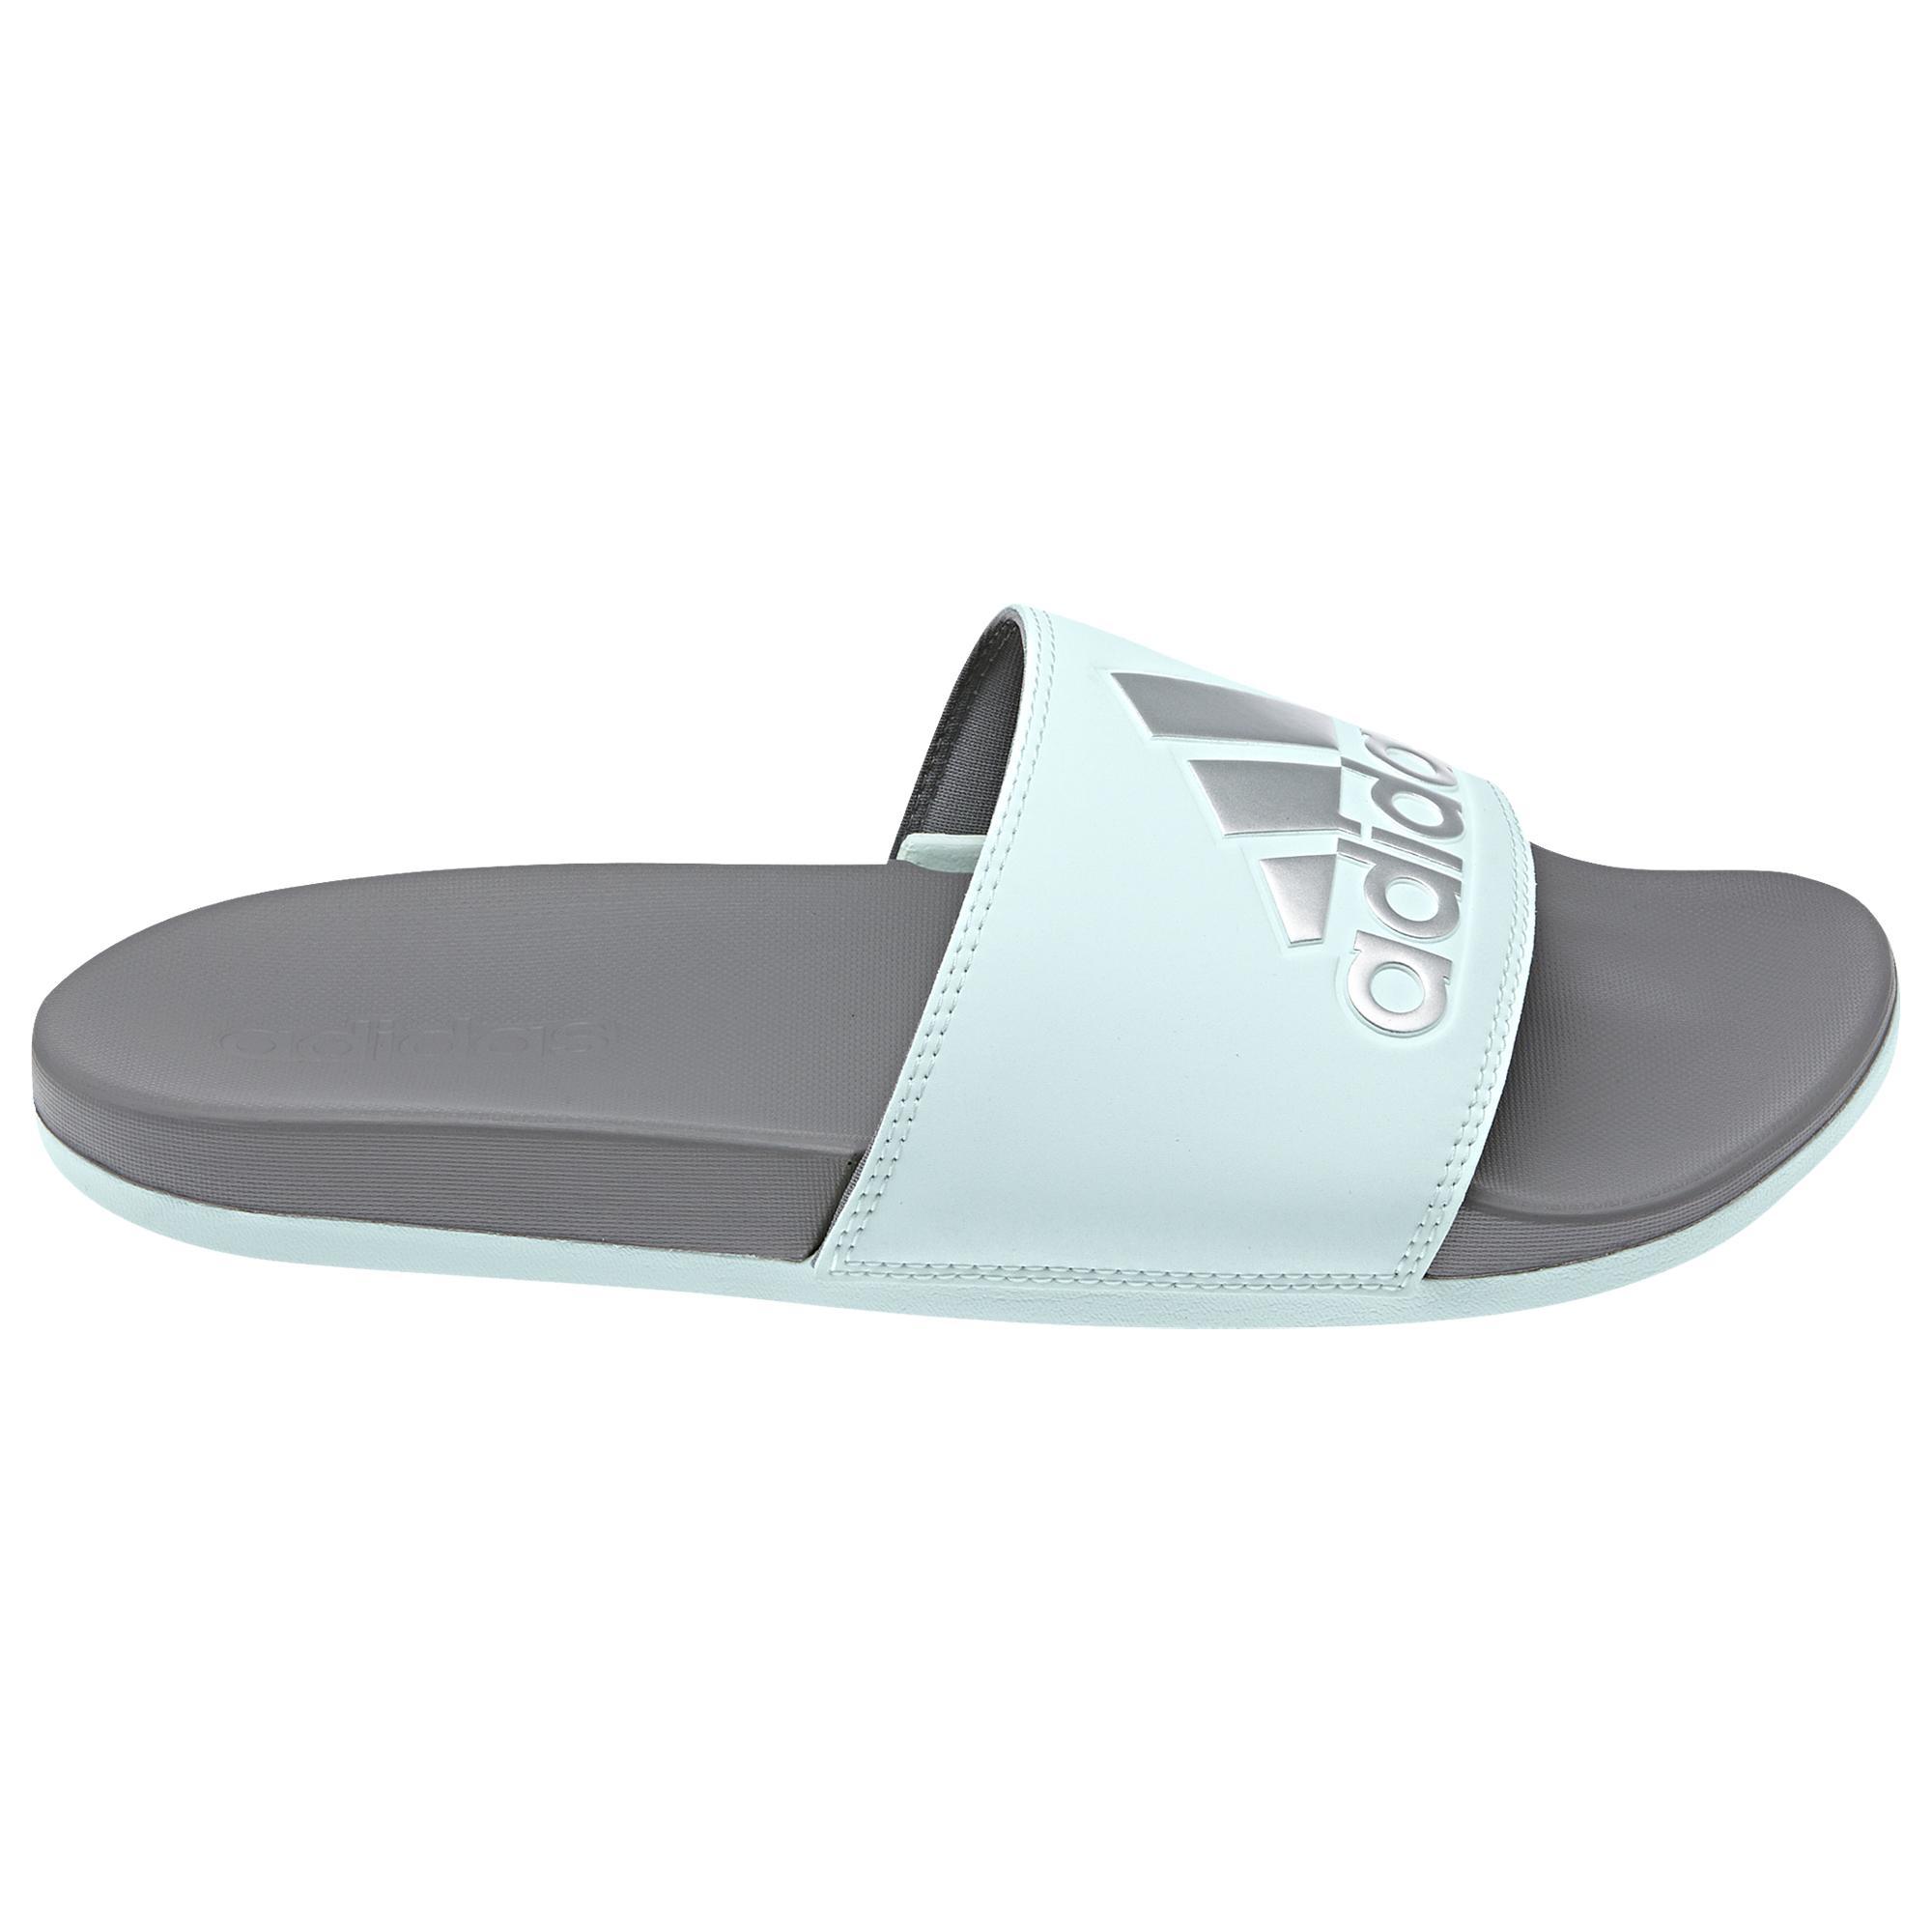 7991d0b2f4f24 Adidas - Multicolor Adilette Cf Plus Slide Shoes - Lyst